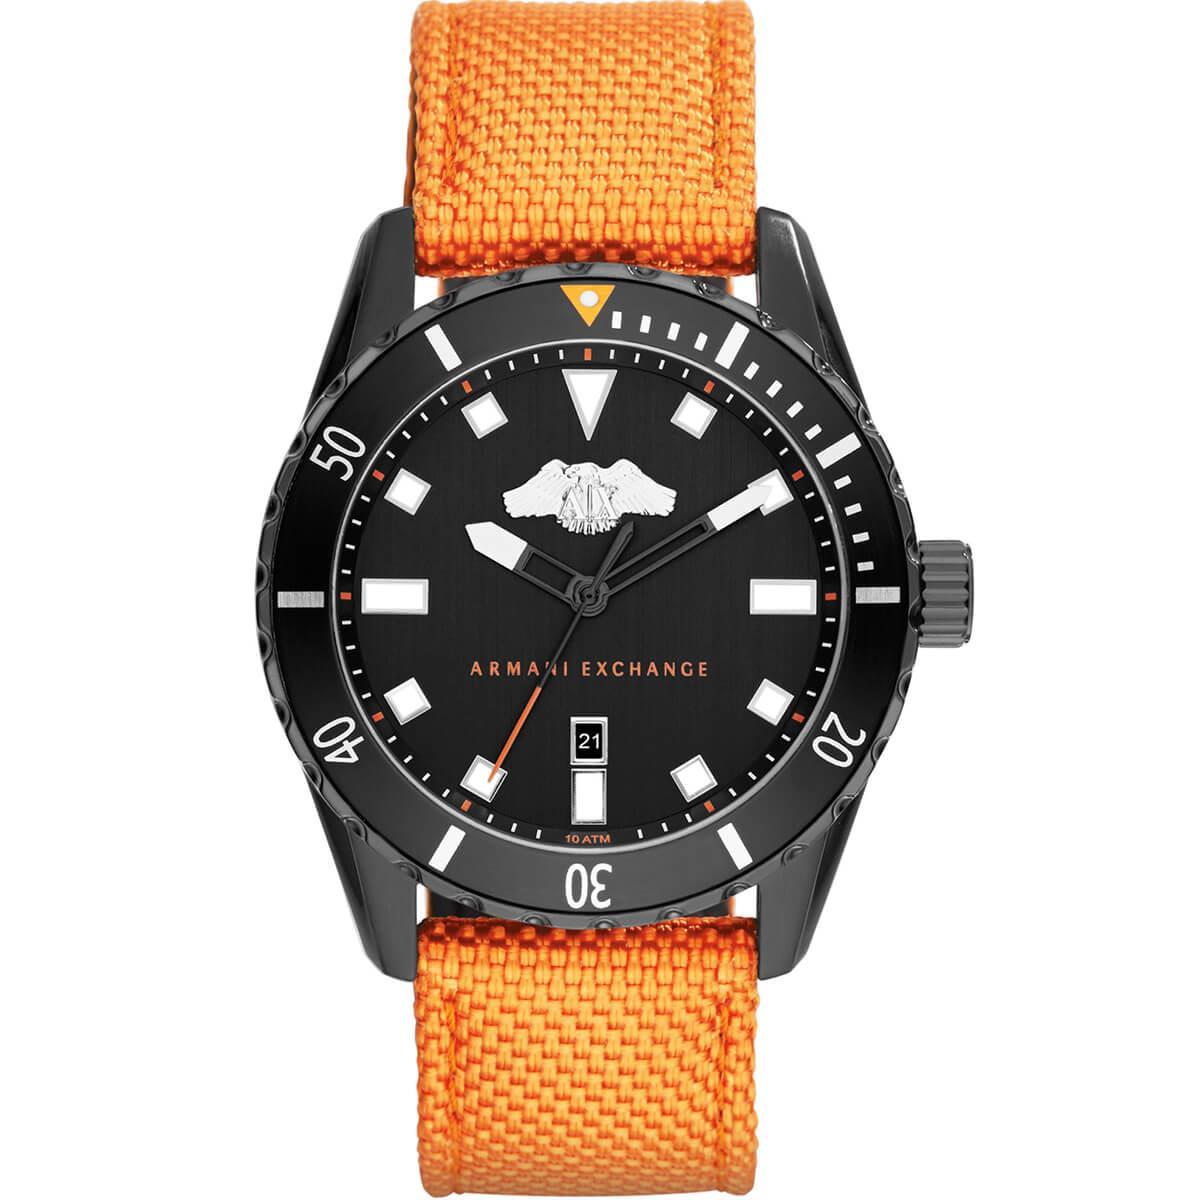 939ae7f638b Relógio Masculino Armani Exchange Ref AX1705 8LN Nylon